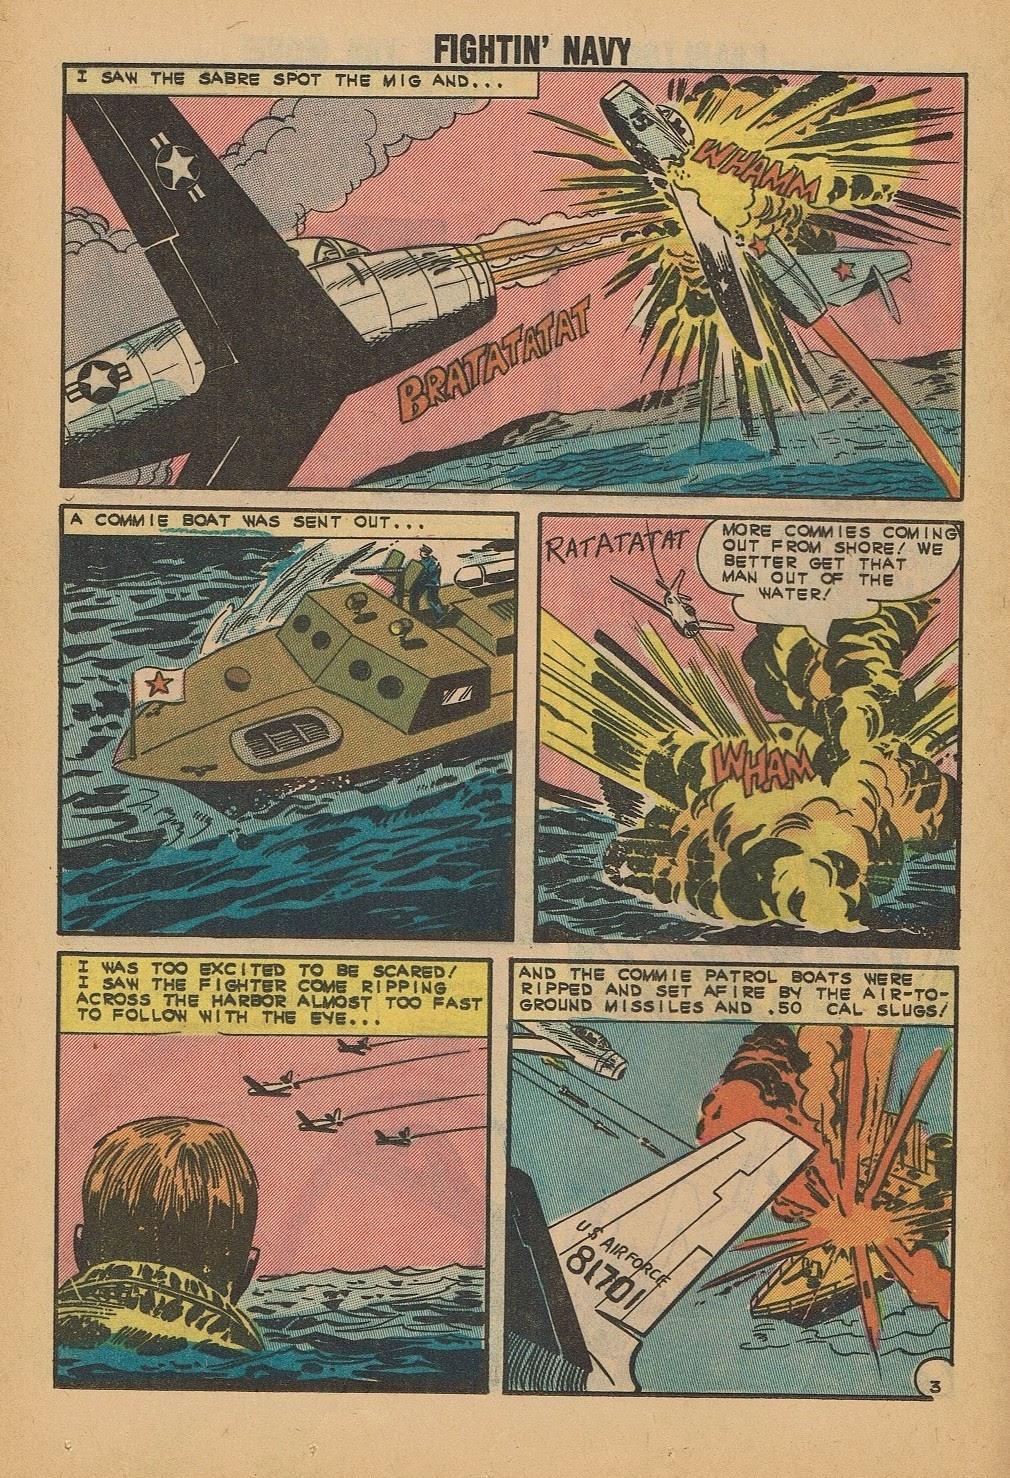 Read online Fightin' Navy comic -  Issue #112 - 24